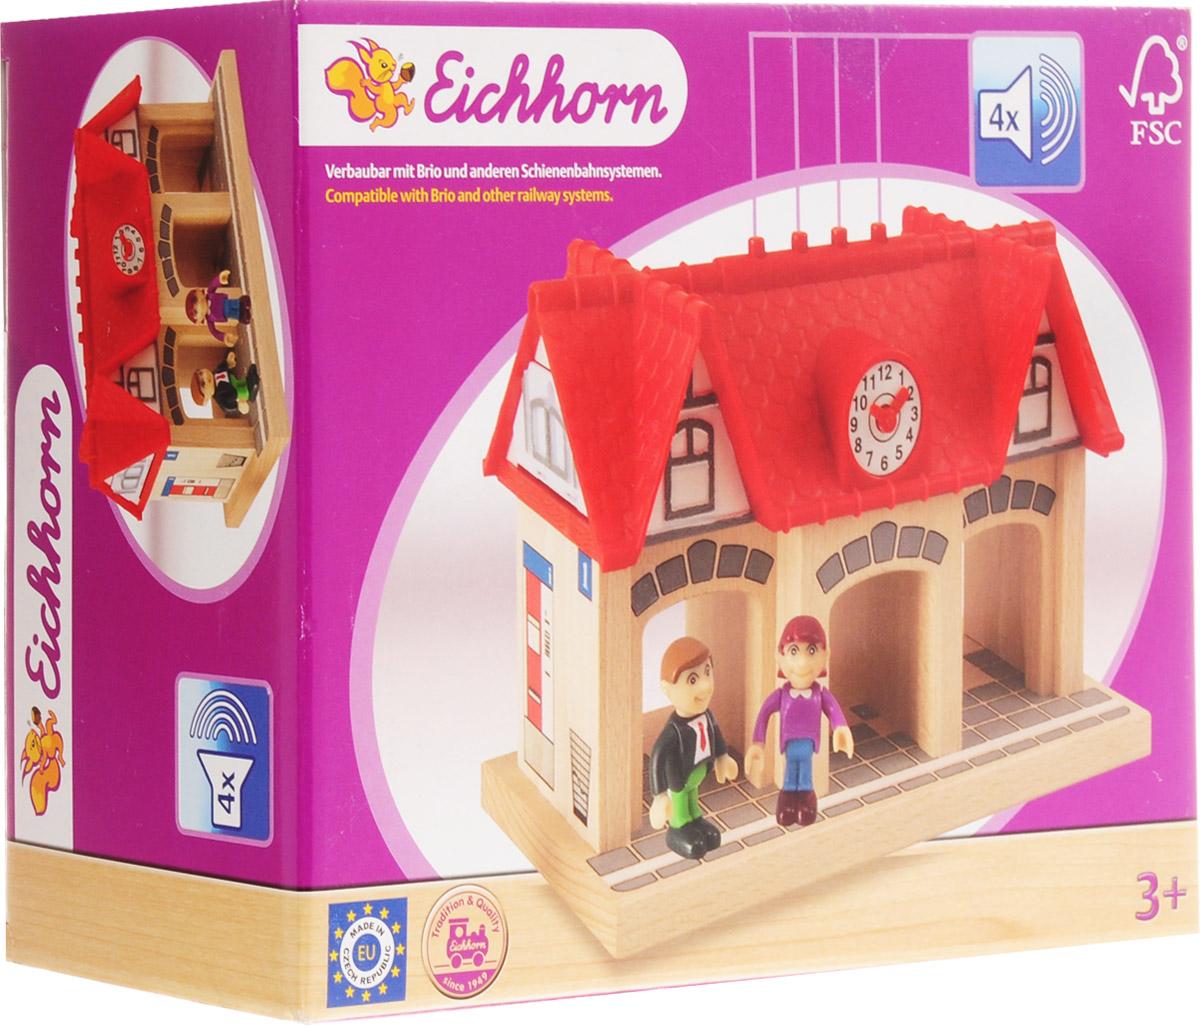 Eichhorn Остановка